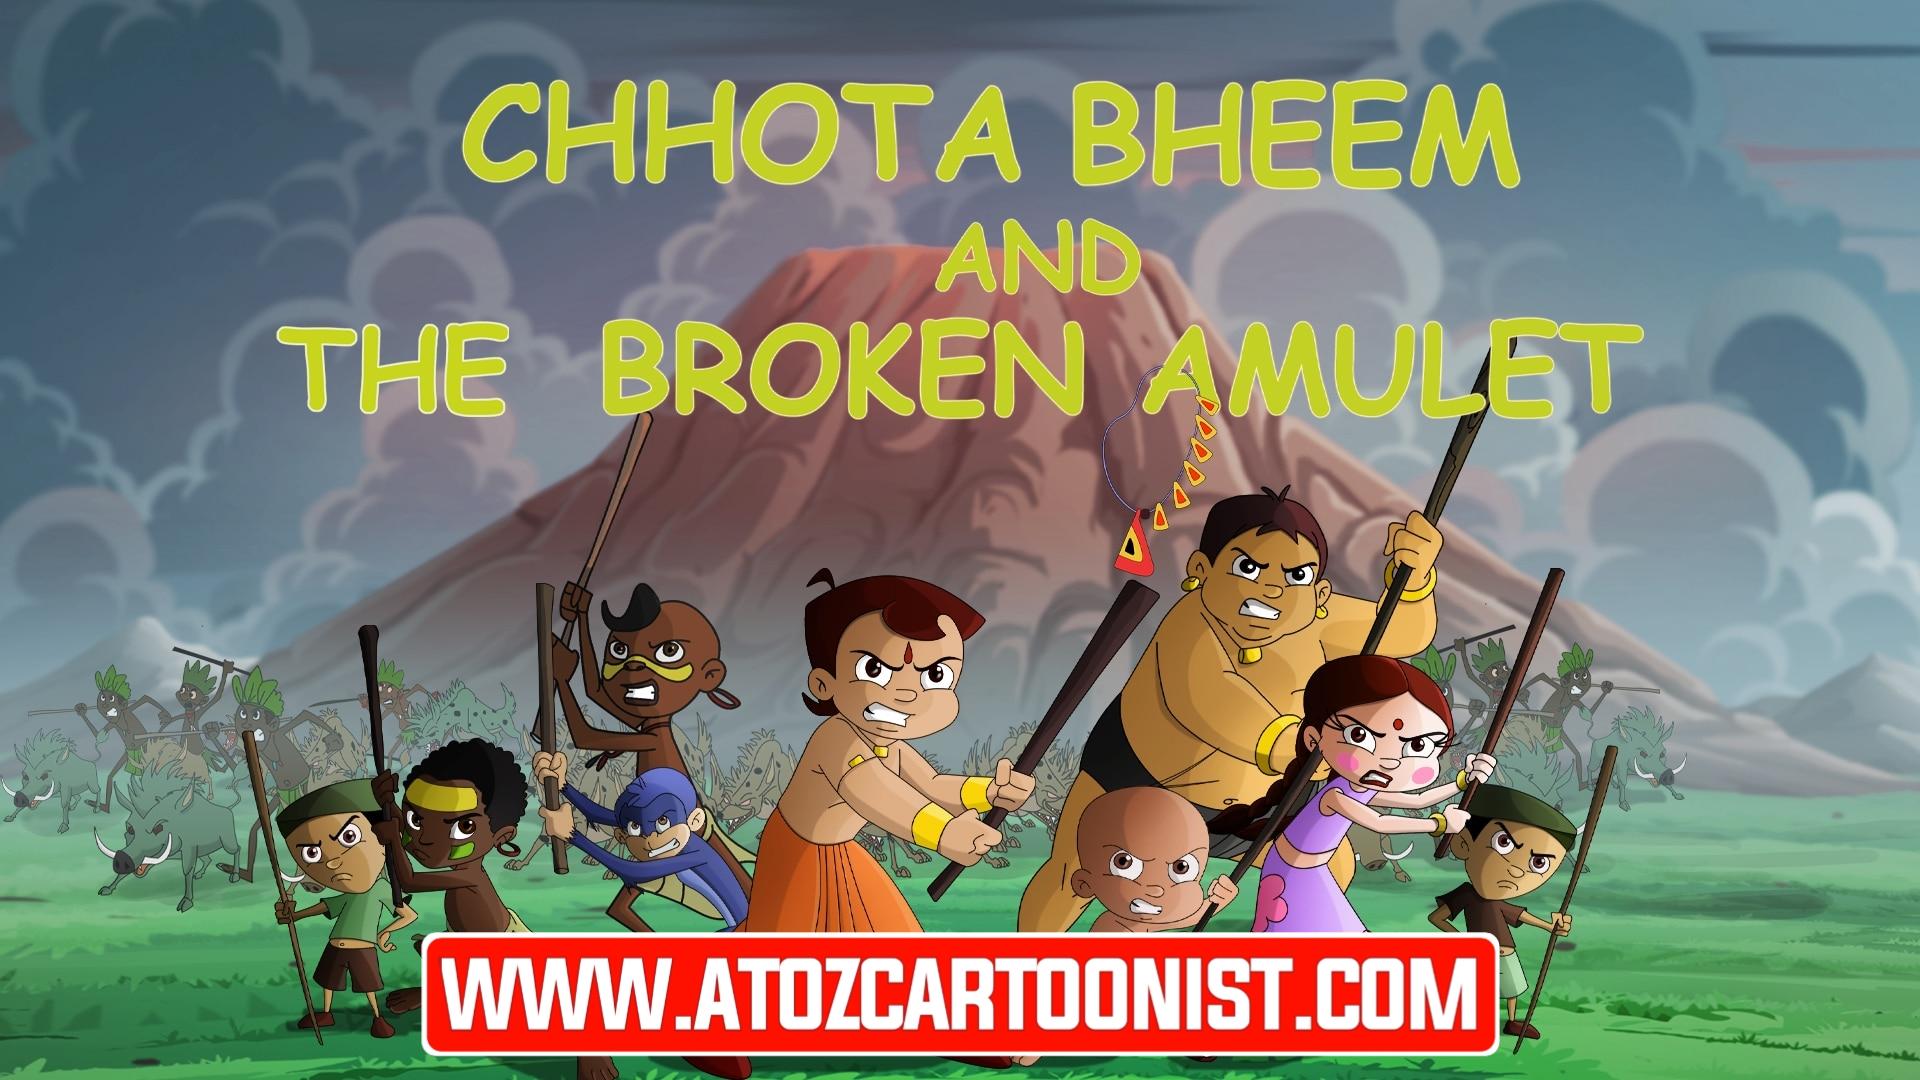 CHHOTA BHEEM IN JUNGLEE KABEELA (THE BROKEN AMULET) FULL MOVIE IN HINDI – TAMIL – TELUGU DOWNLOAD (480P, 720P & 1080P)